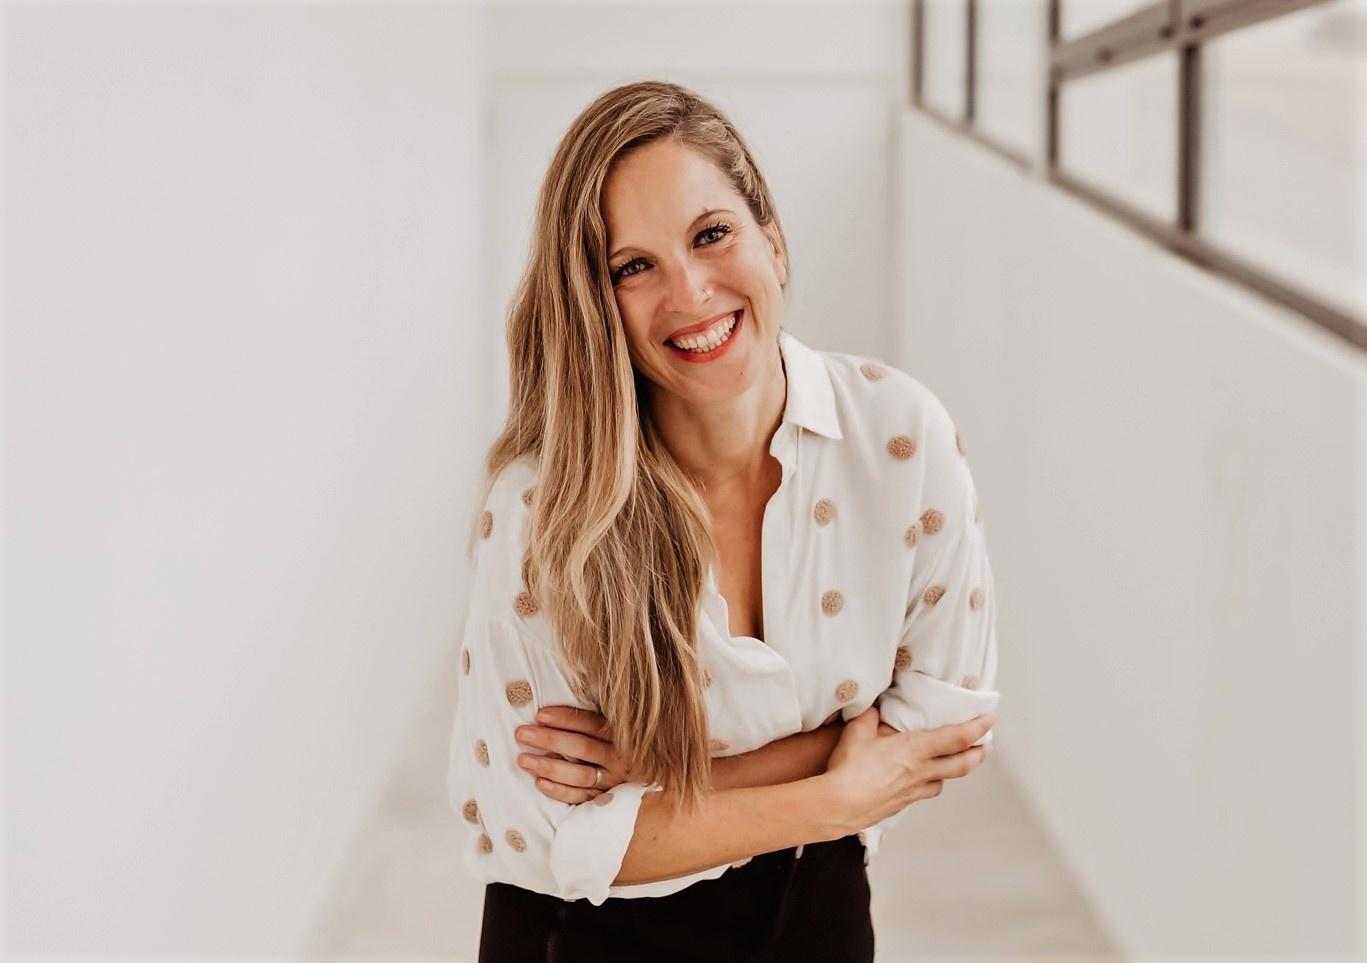 Cristina Martínez Ballestero